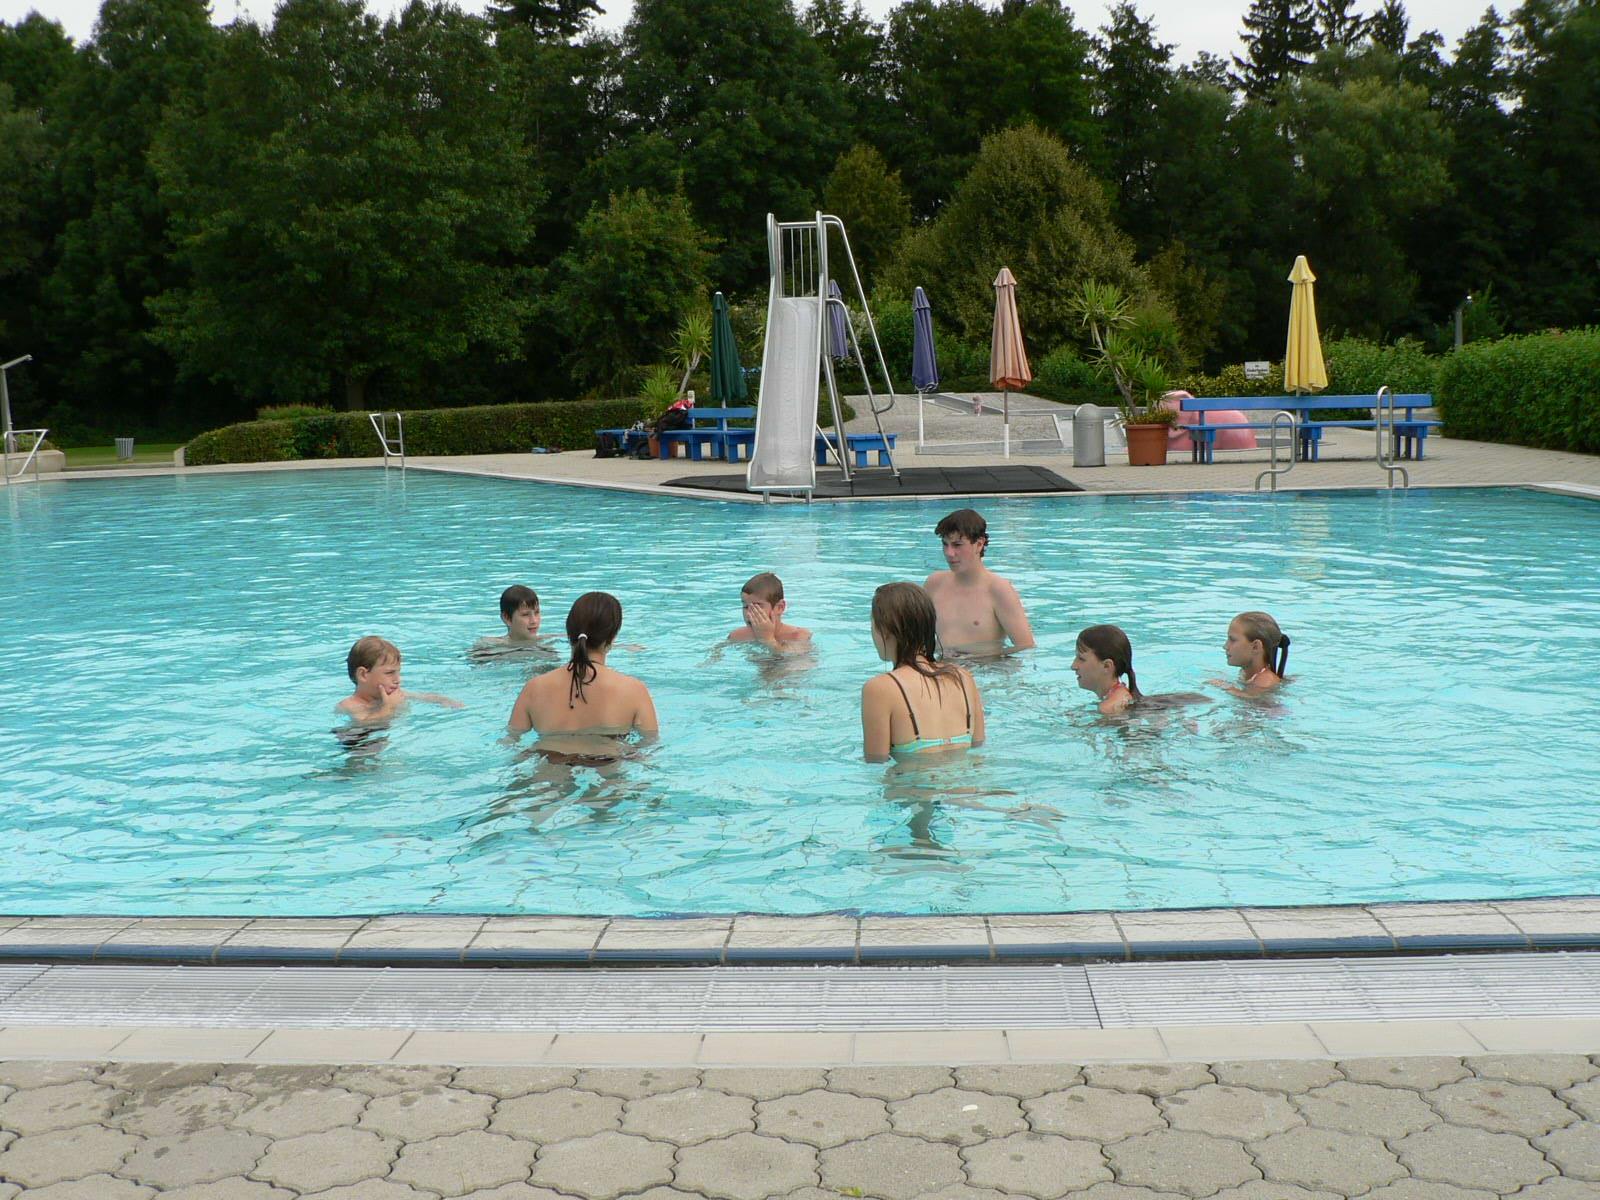 Ausbildung zum Rettungsschwimmer - Start am 25. April